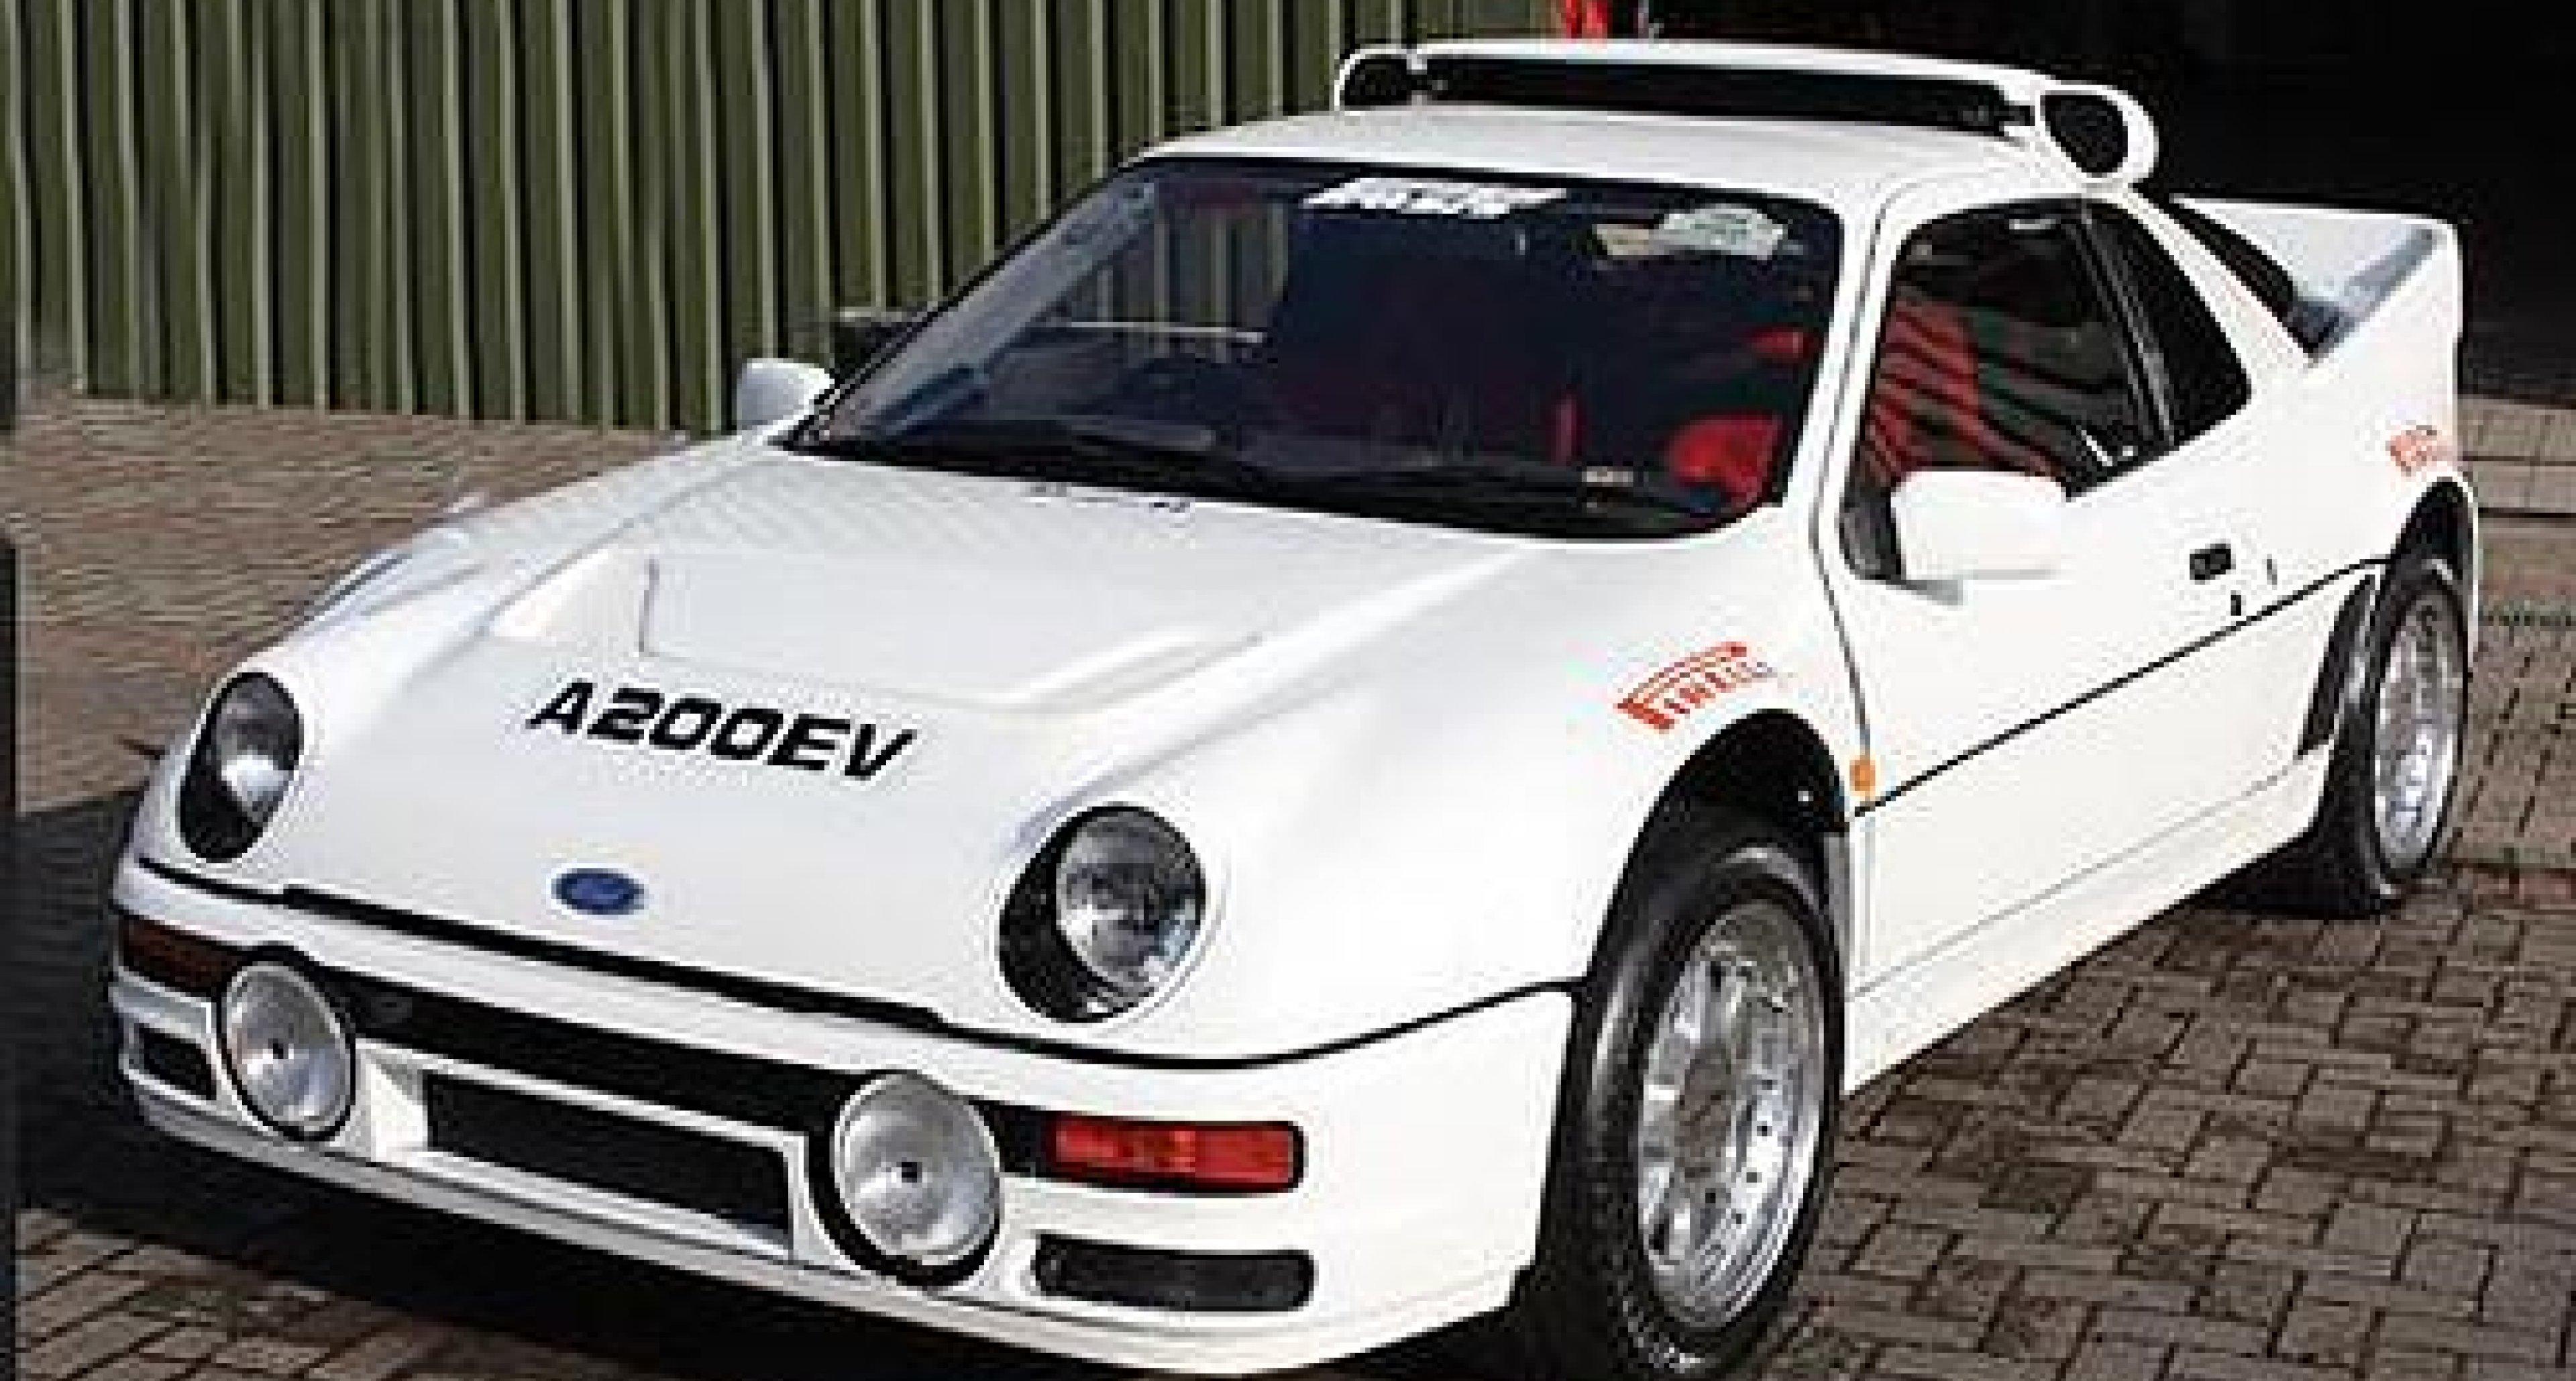 Coys  at The Autosport International Racing Car Show 15 Jan 2011 - Preview